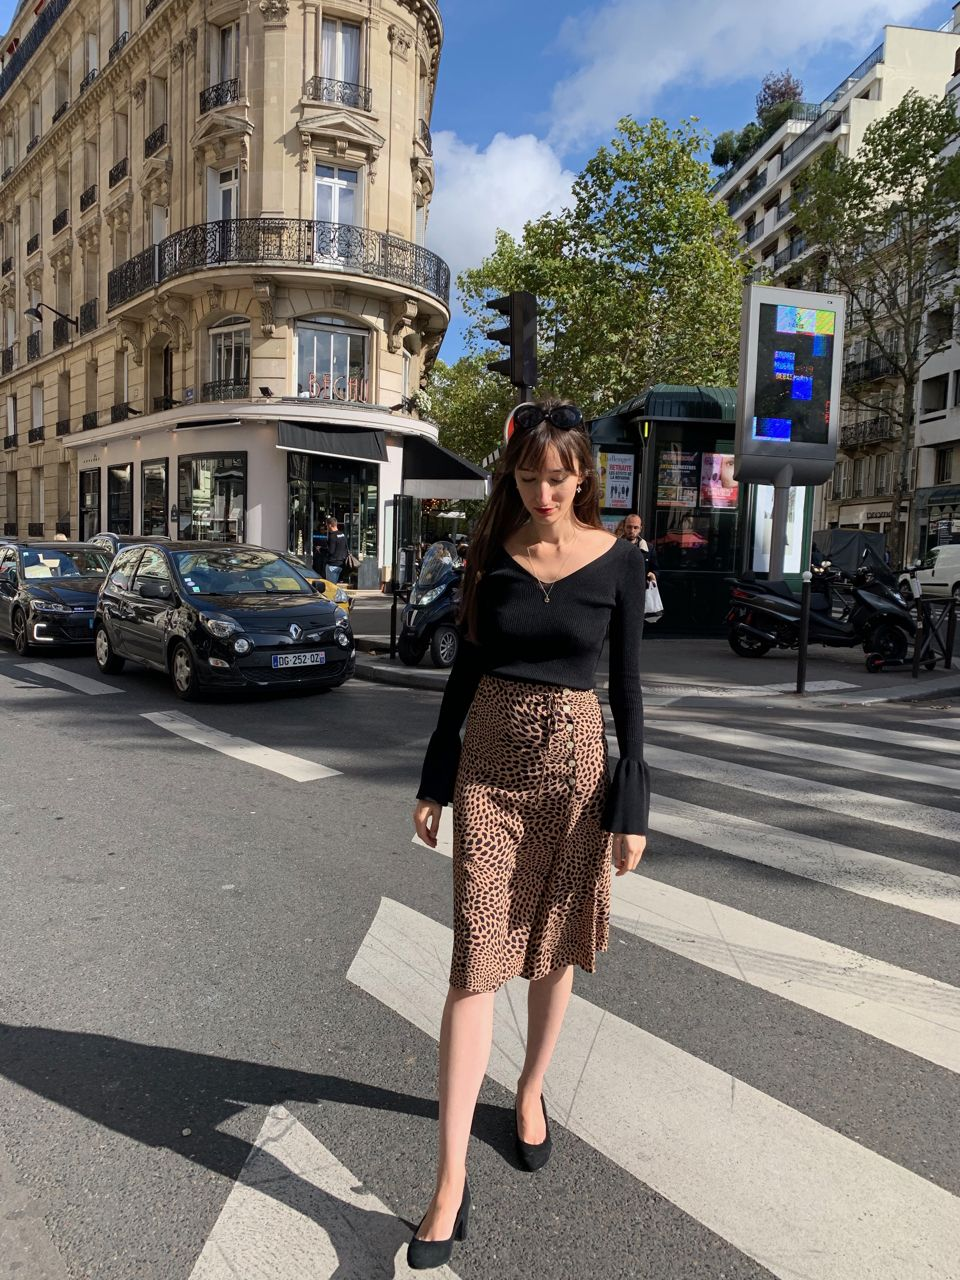 Early Fall Parisian Looks - Rouje skirt